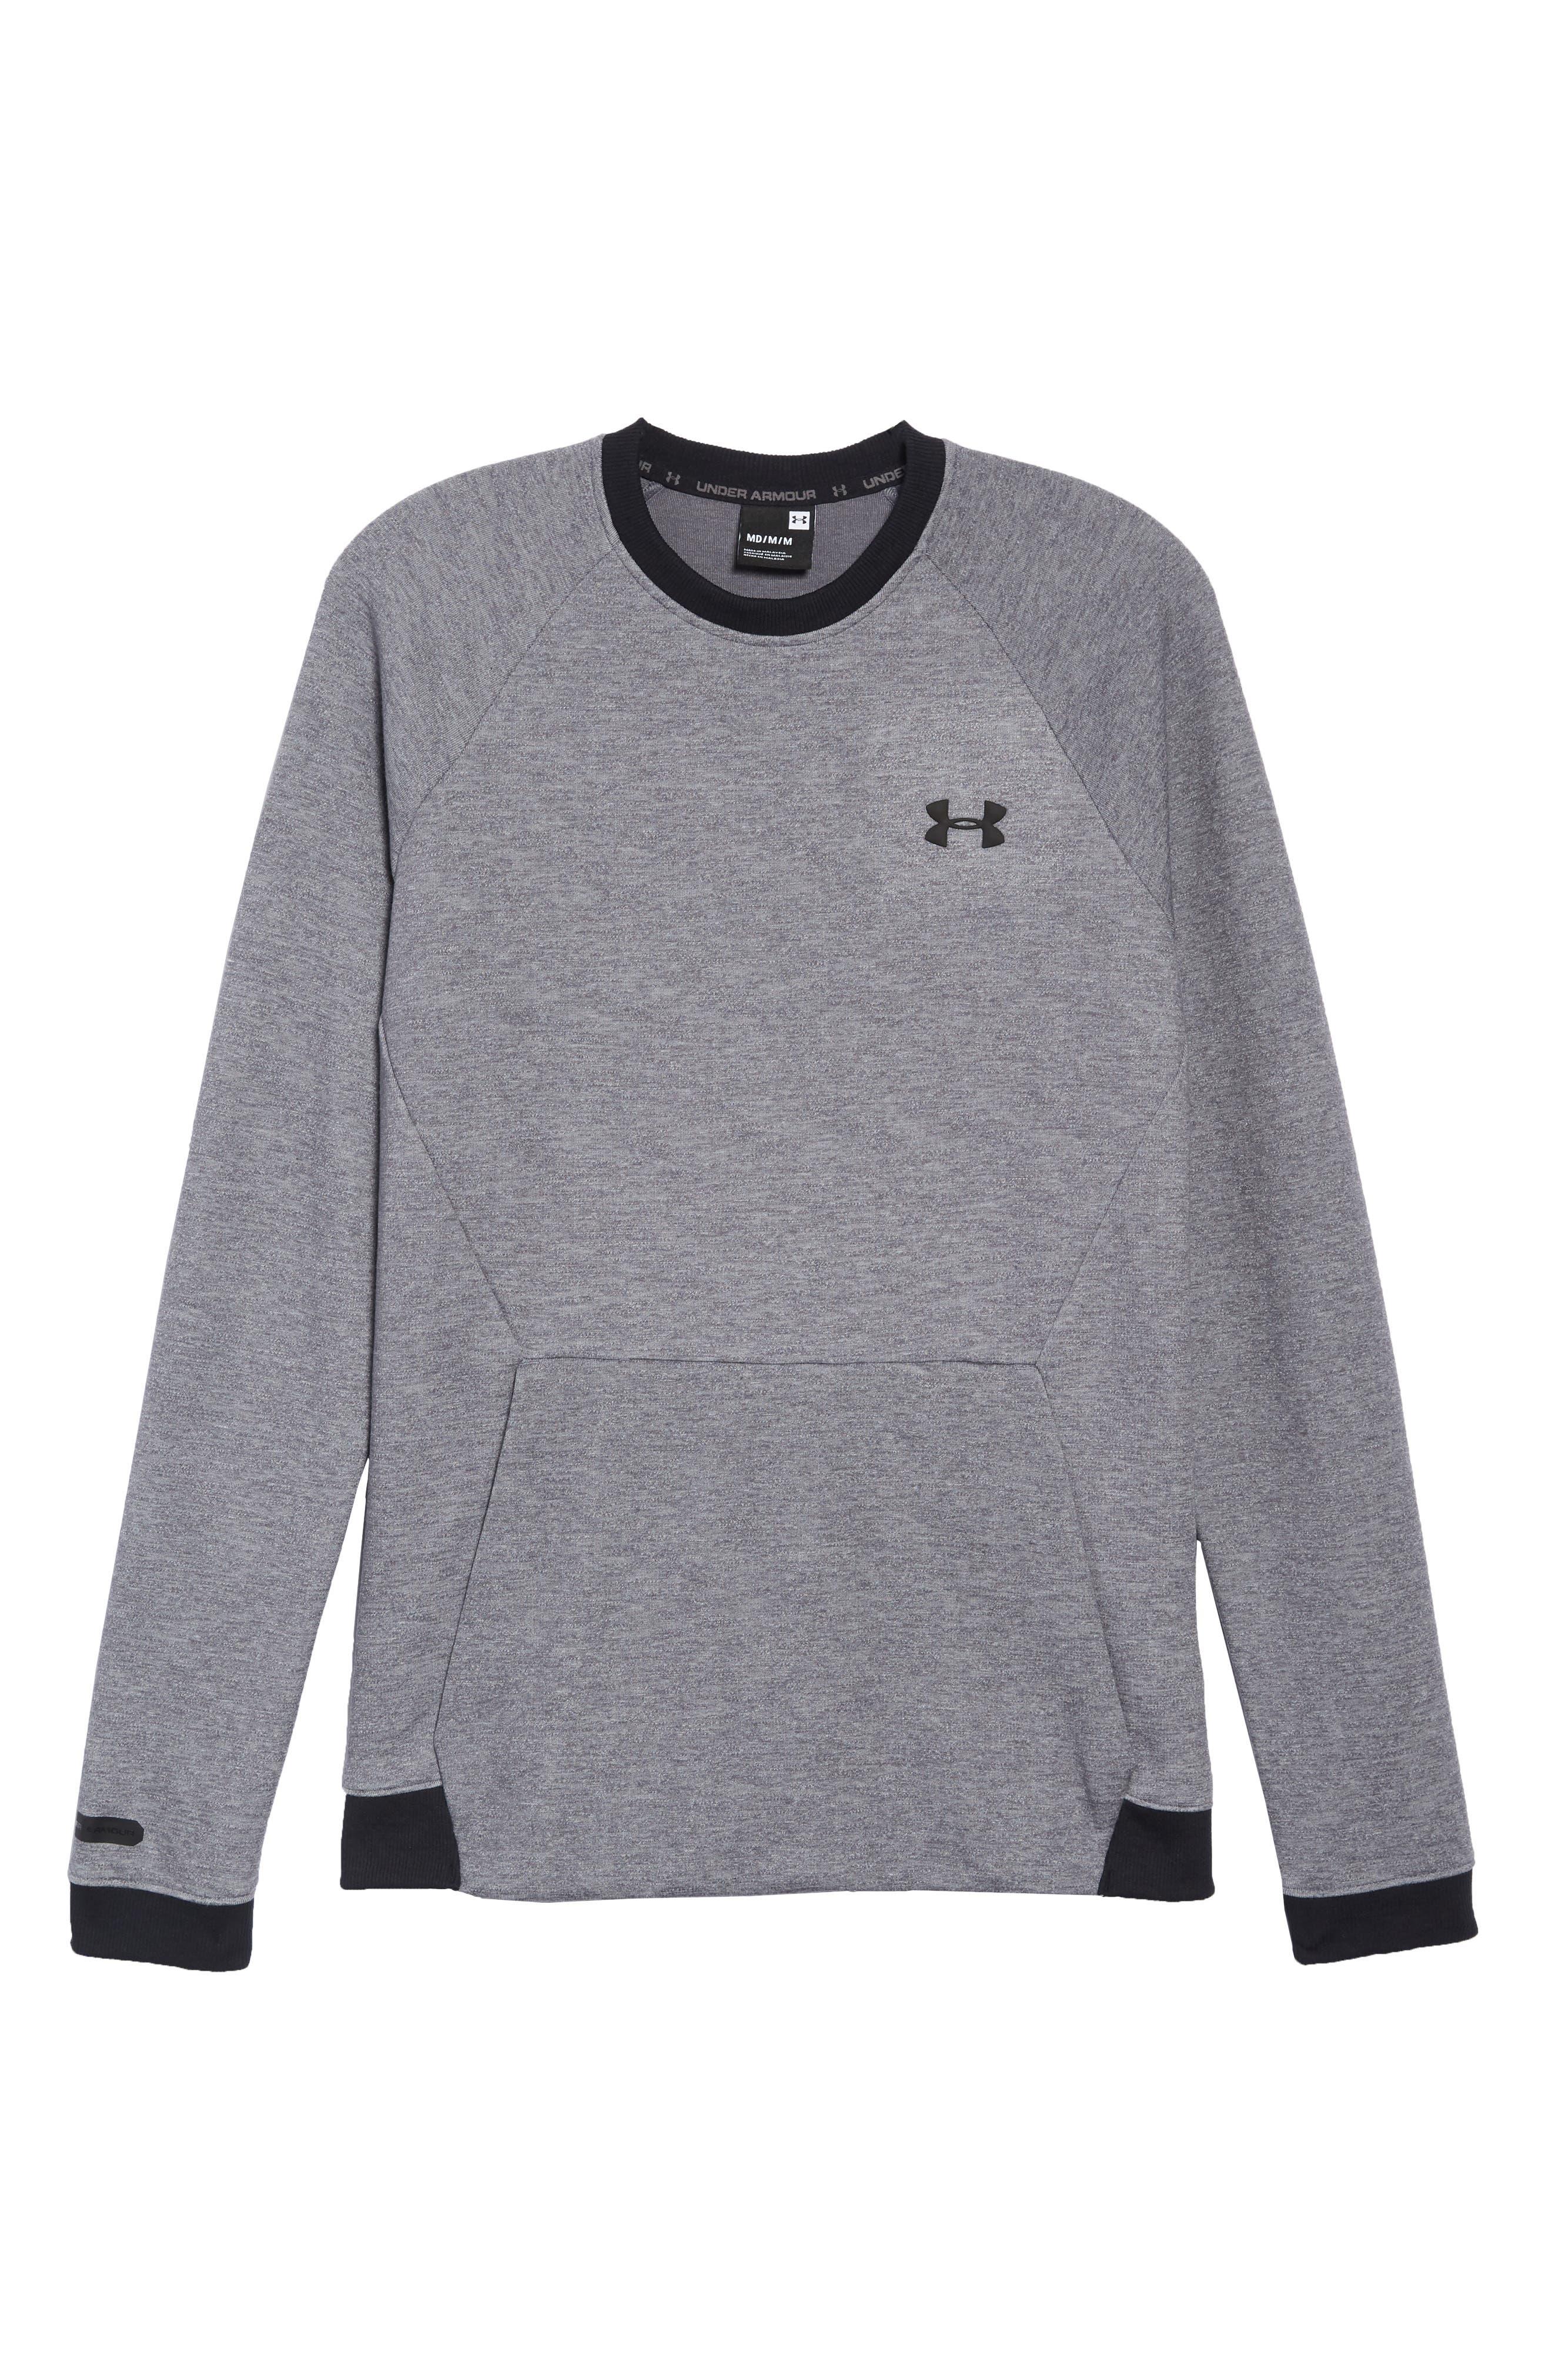 UNDER ARMOUR,                             Sportstyle 2x Crew Sweatshirt,                             Alternate thumbnail 6, color,                             STEEL